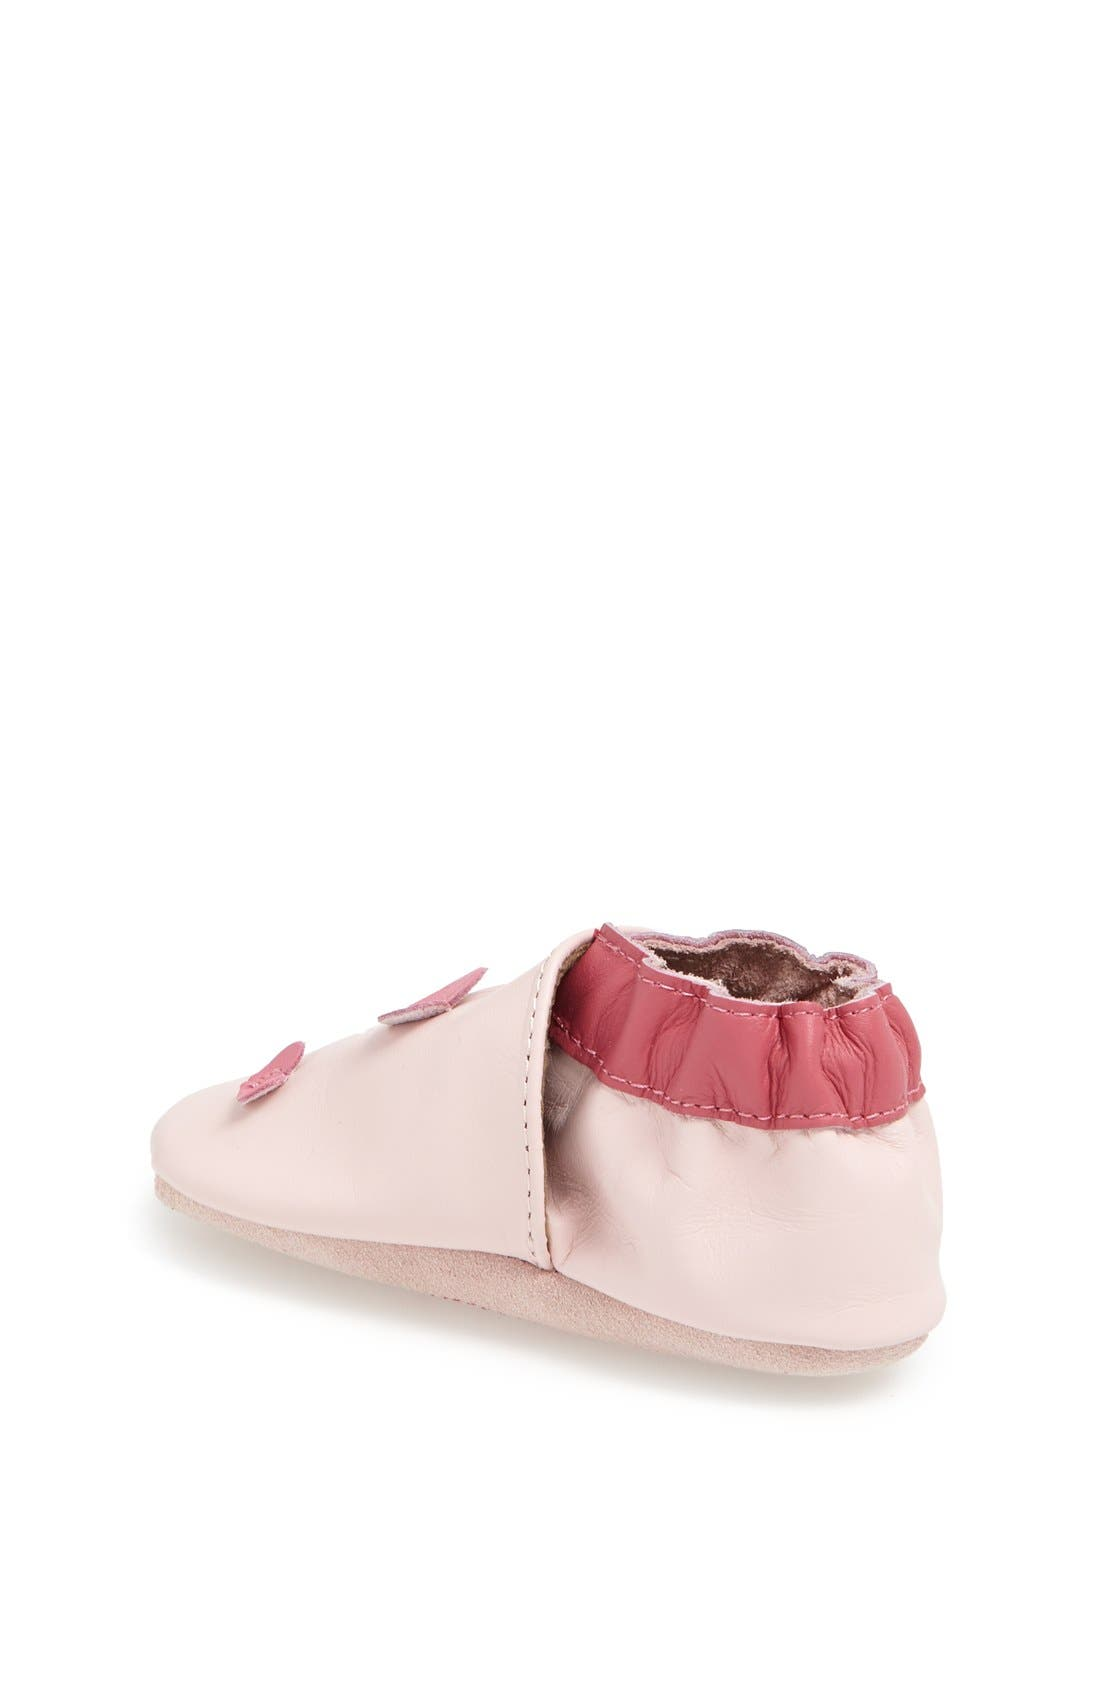 'Sweet Heart' Crib Shoe,                             Alternate thumbnail 2, color,                             Pink